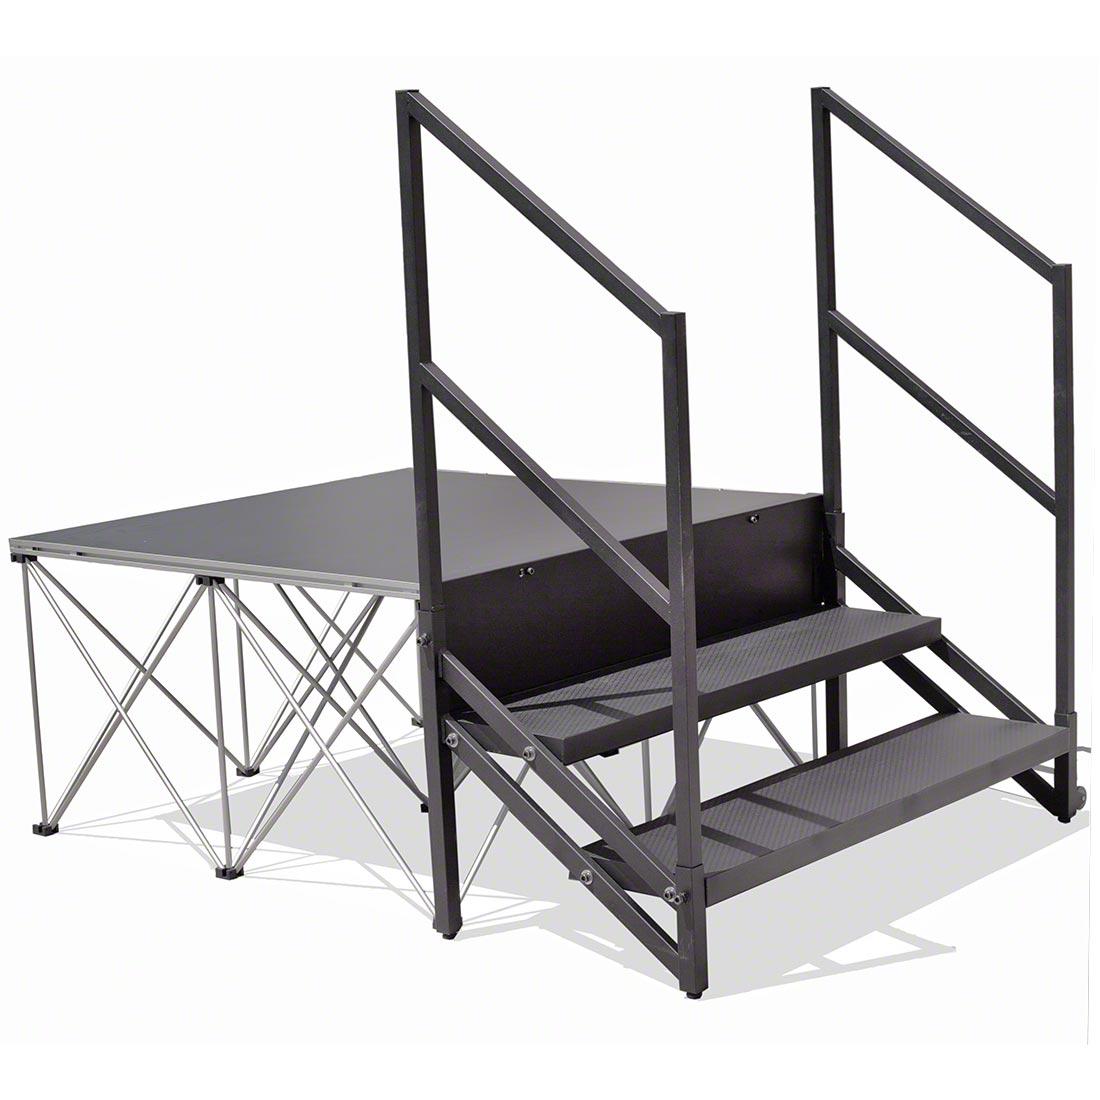 Etonnant StageDrop Portable Stage U0026 Truss